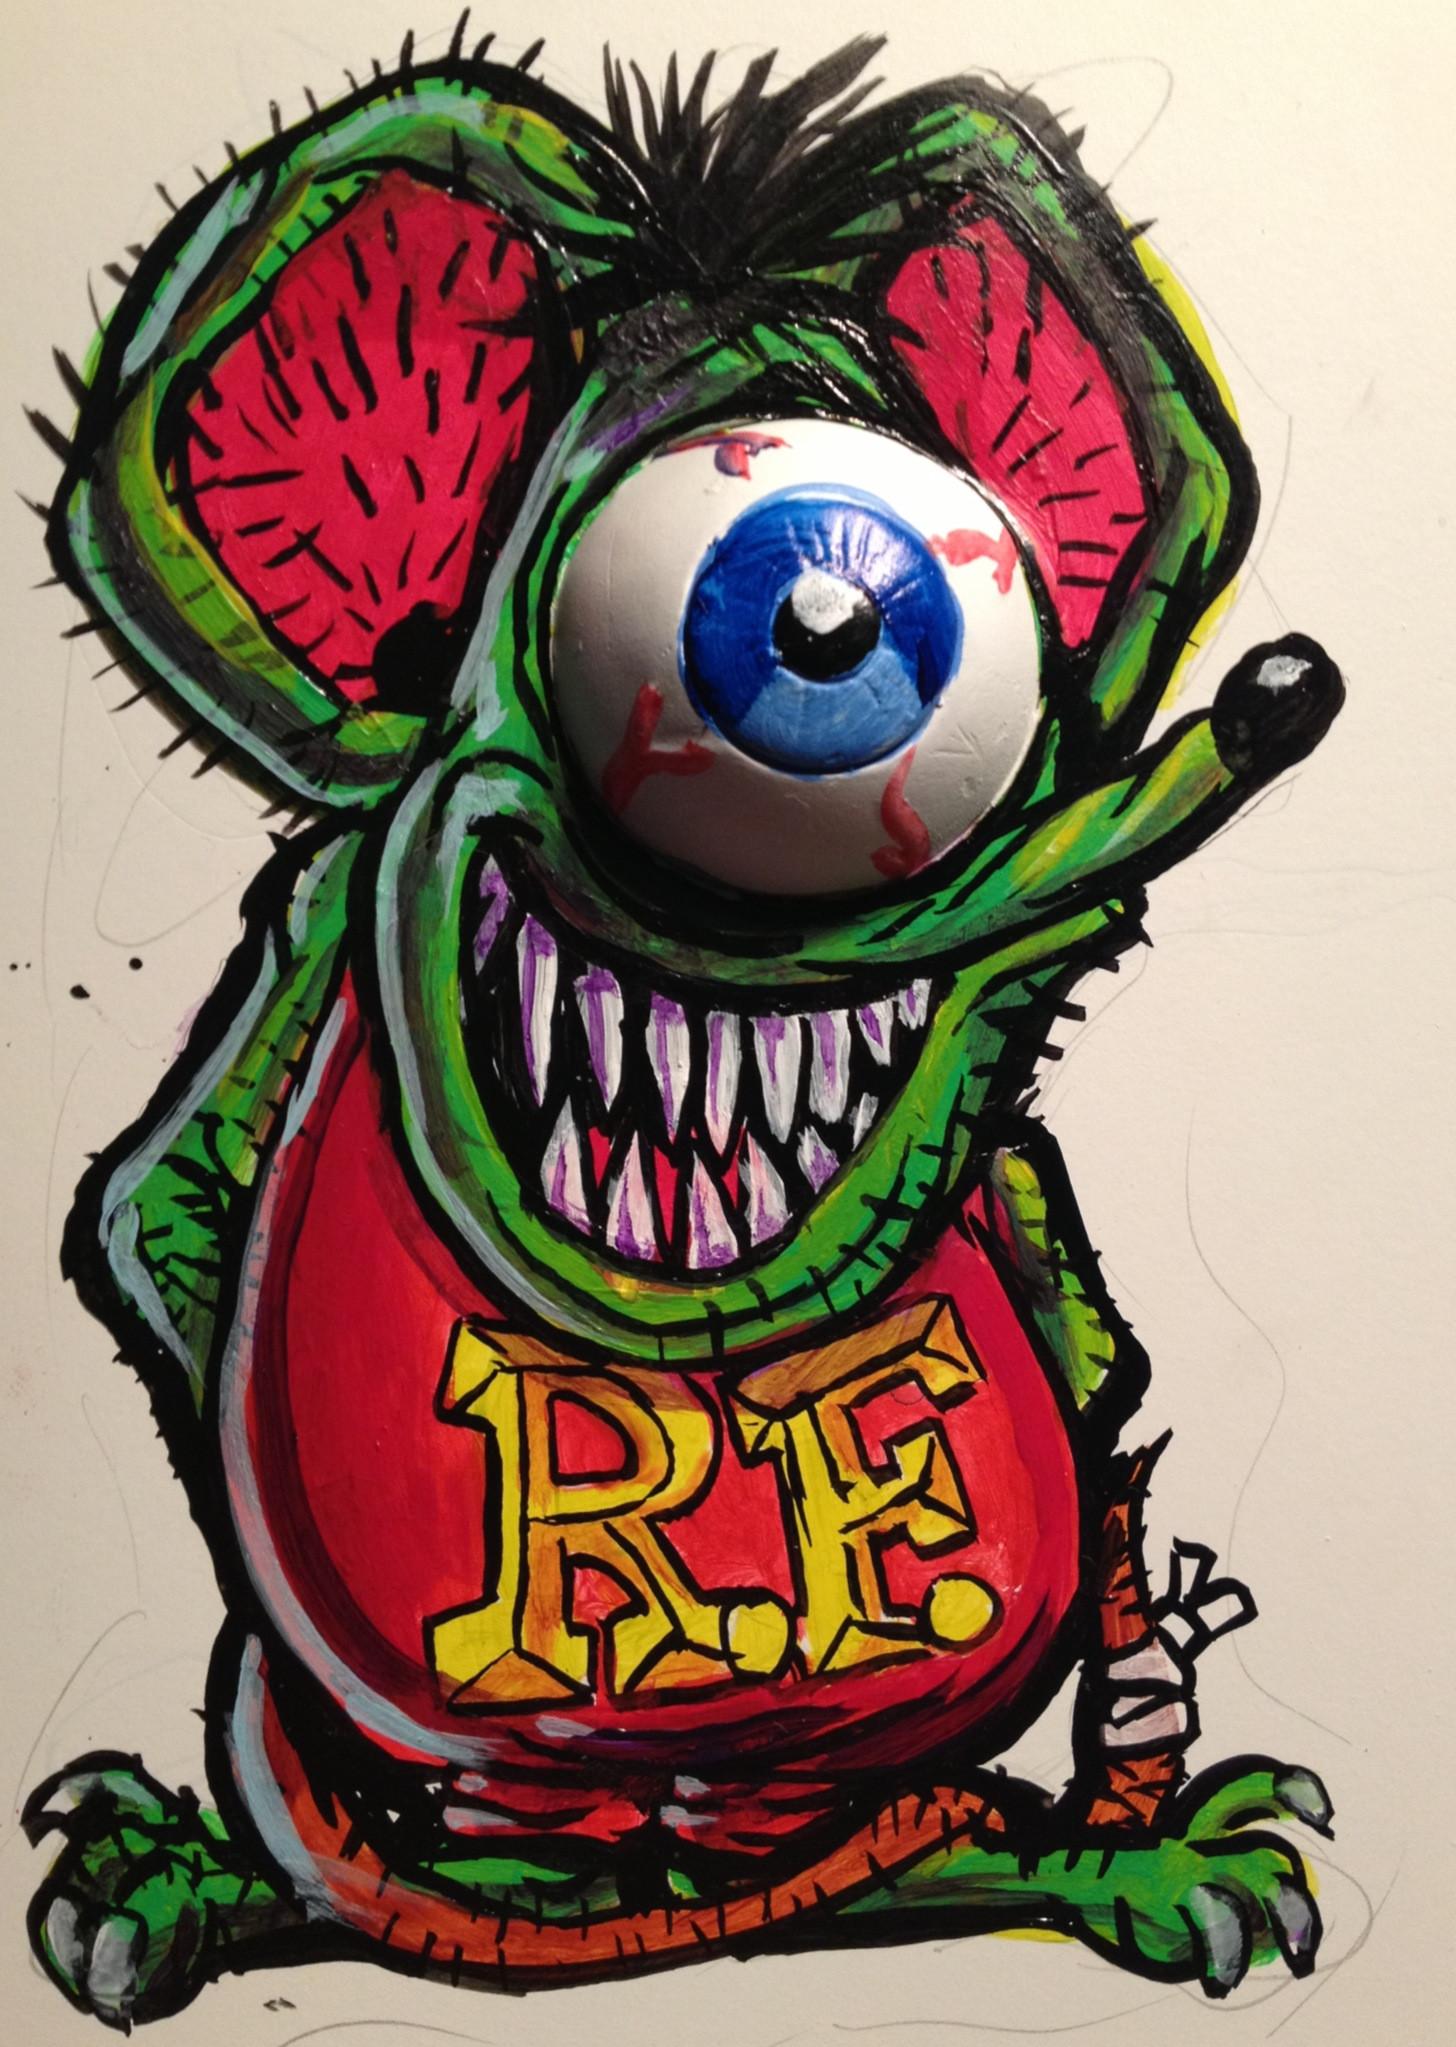 Rat Fink Wallpapers ·① WallpaperTag